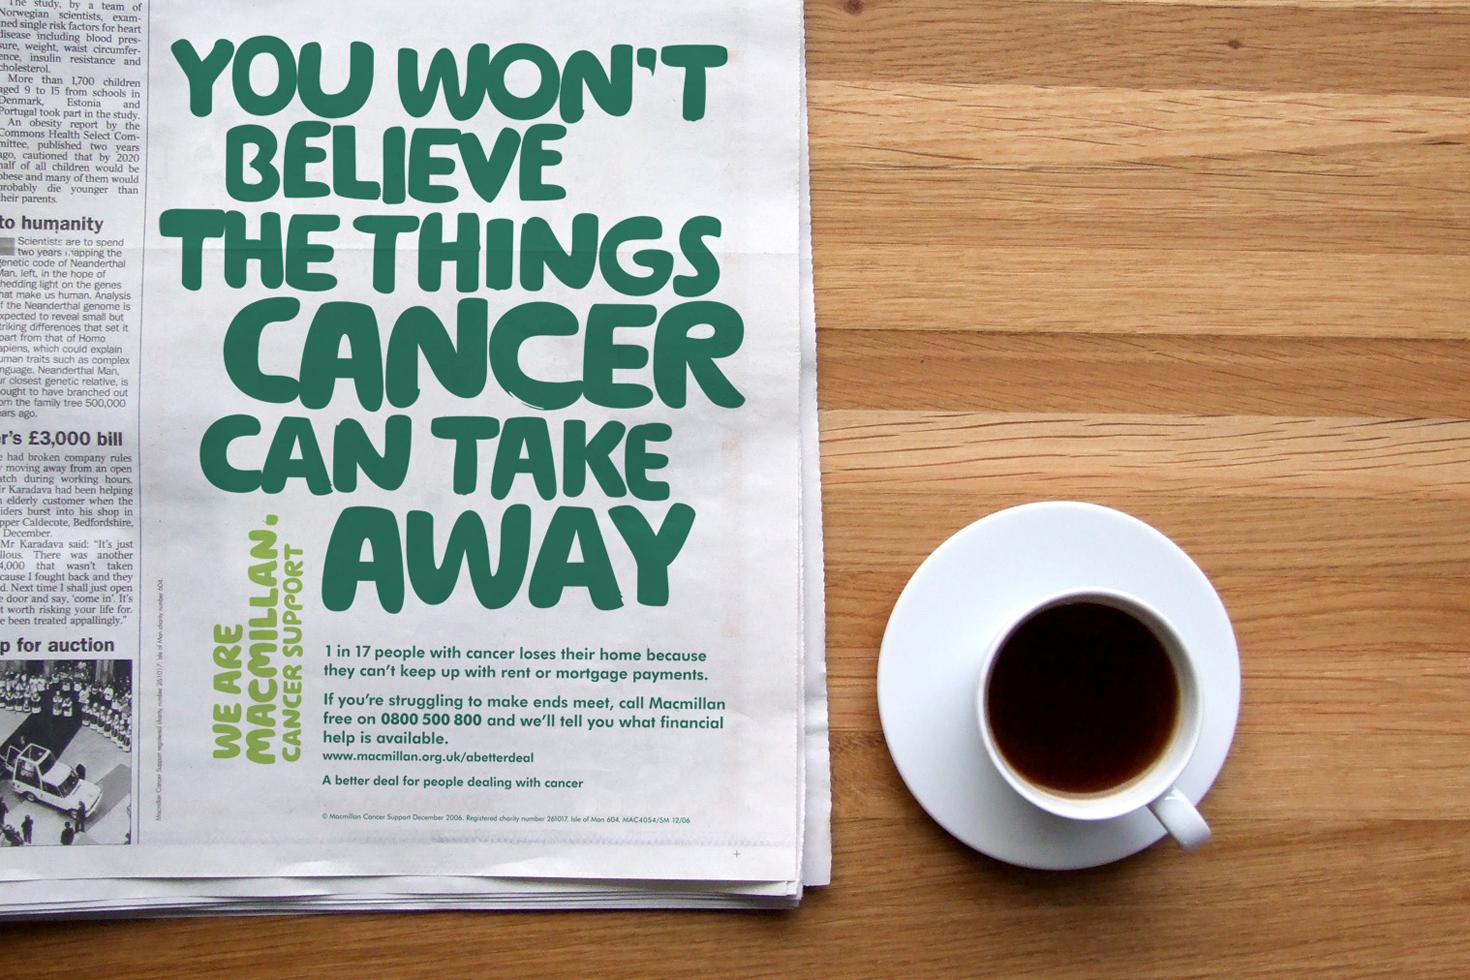 Macmillan Cancer Support advert